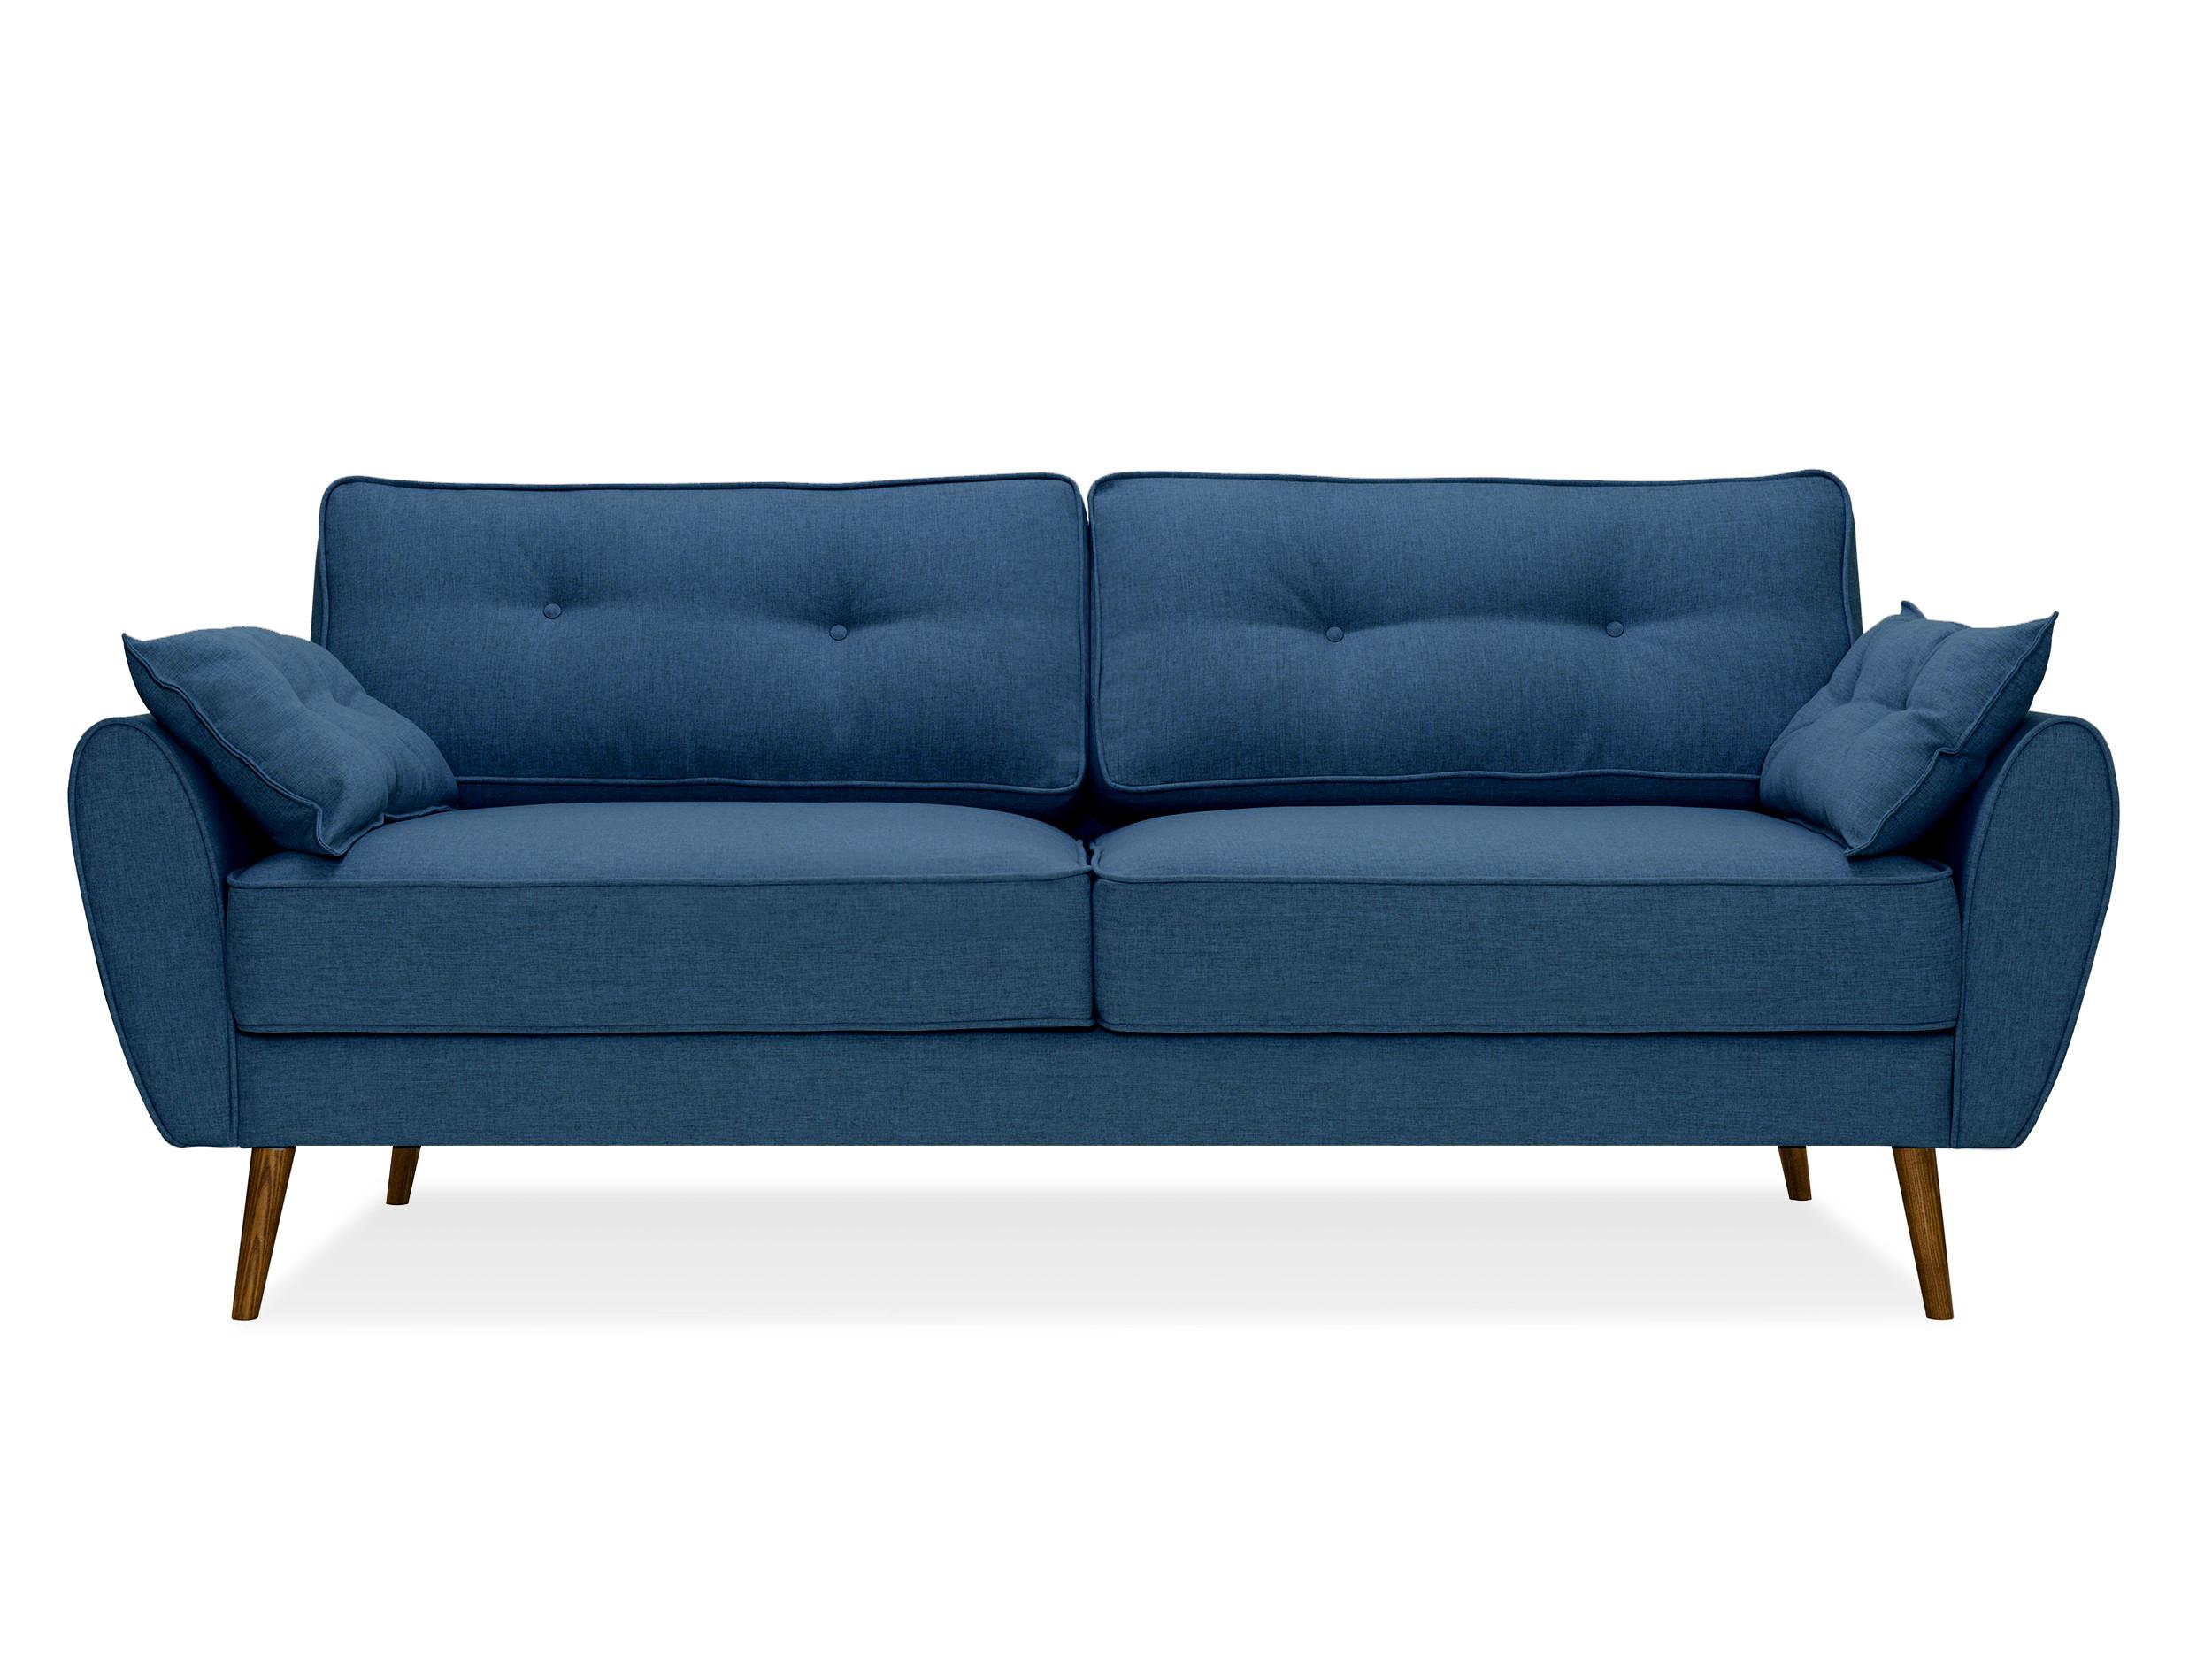 Myfurnish диван vogue синий  66699/15